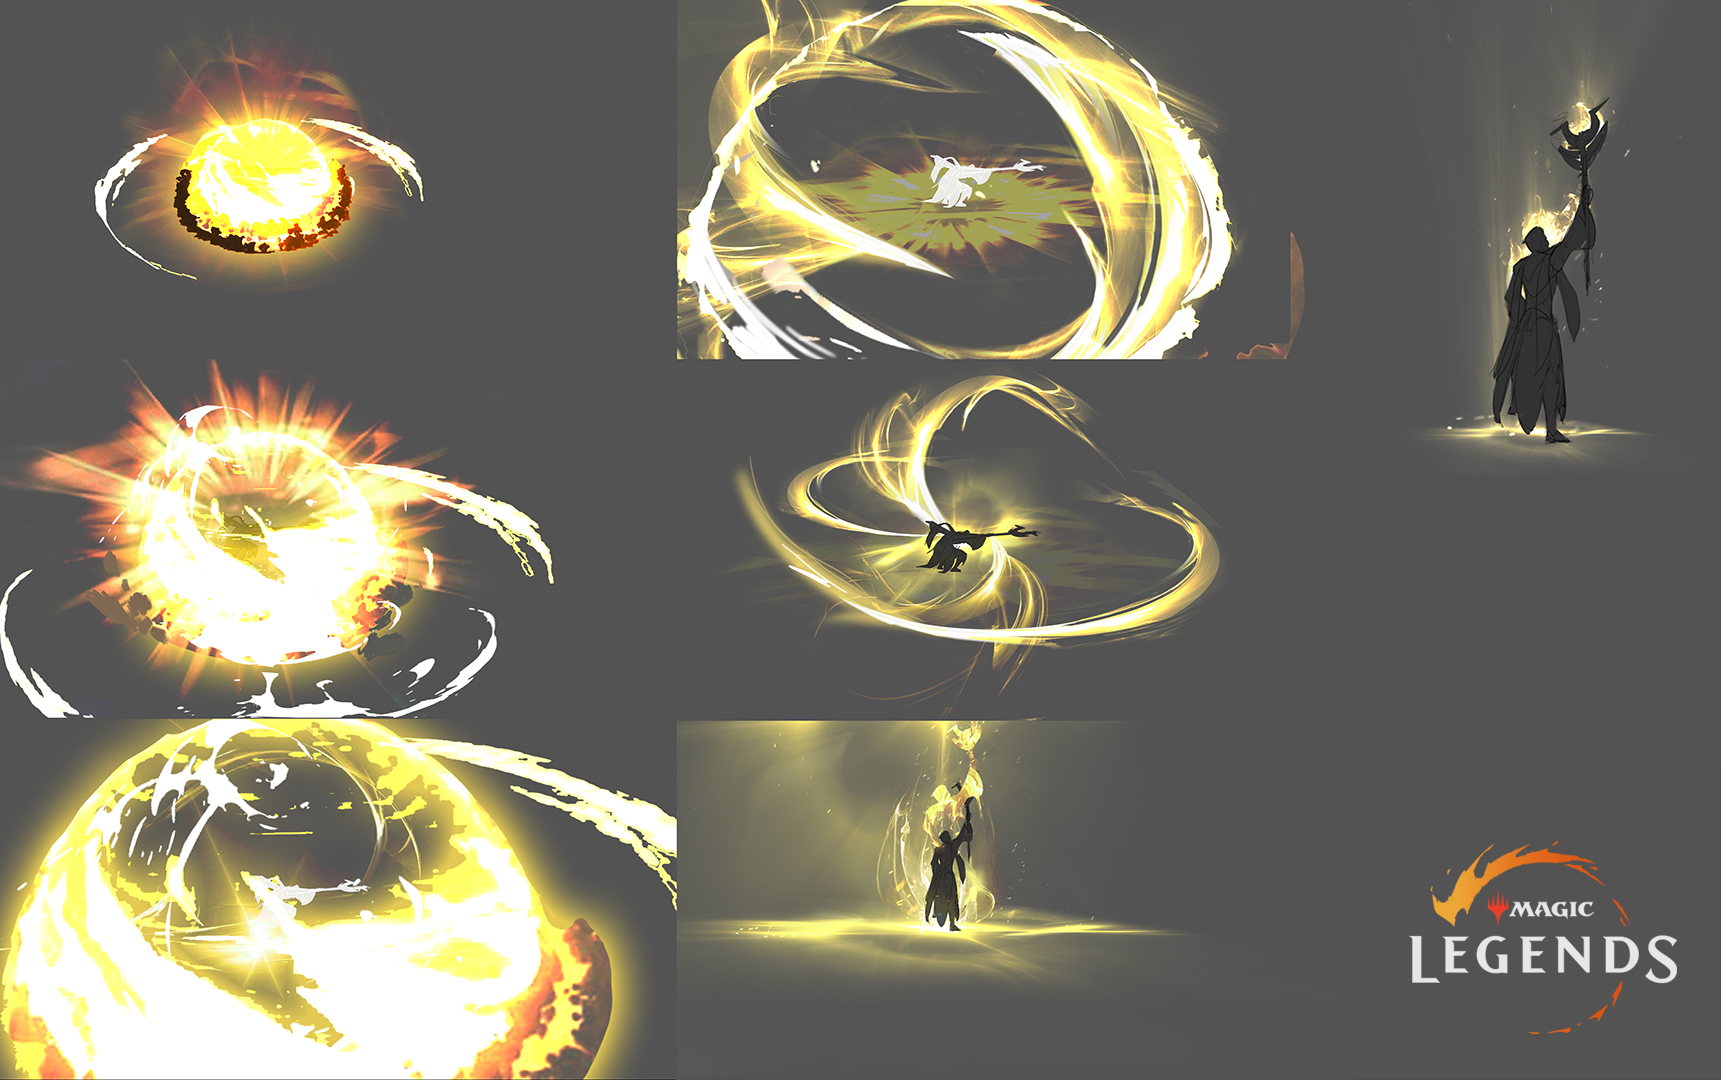 Magic-Legends_2020_07-30-20_001